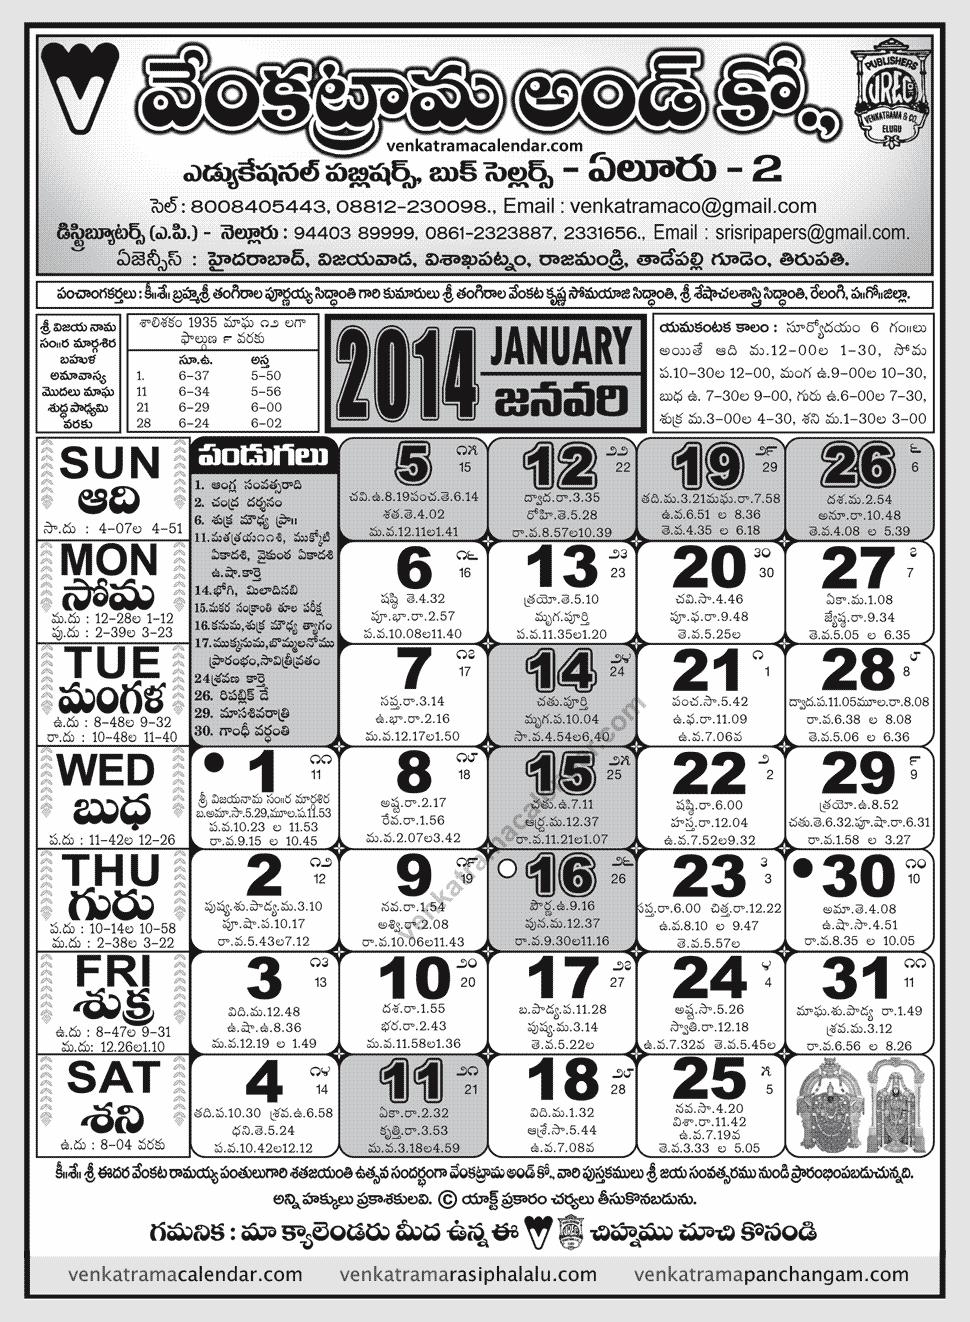 telugu calendar 2017 venkatrama and co pdf